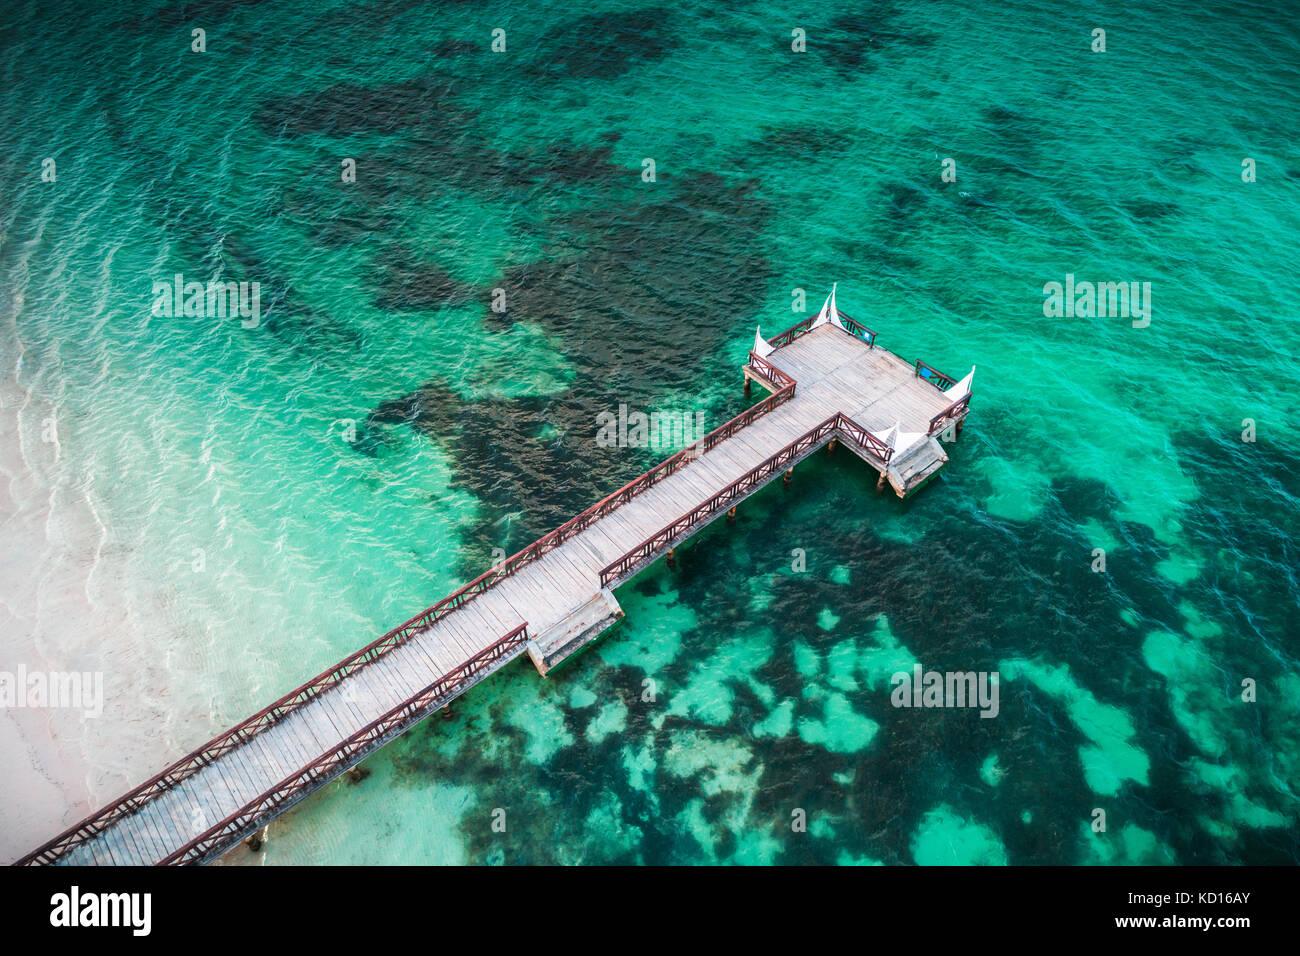 Vista aérea del muelle de madera tropical y aguas azul turquesa del mar Caribe, en Punta Cana, República Imagen De Stock